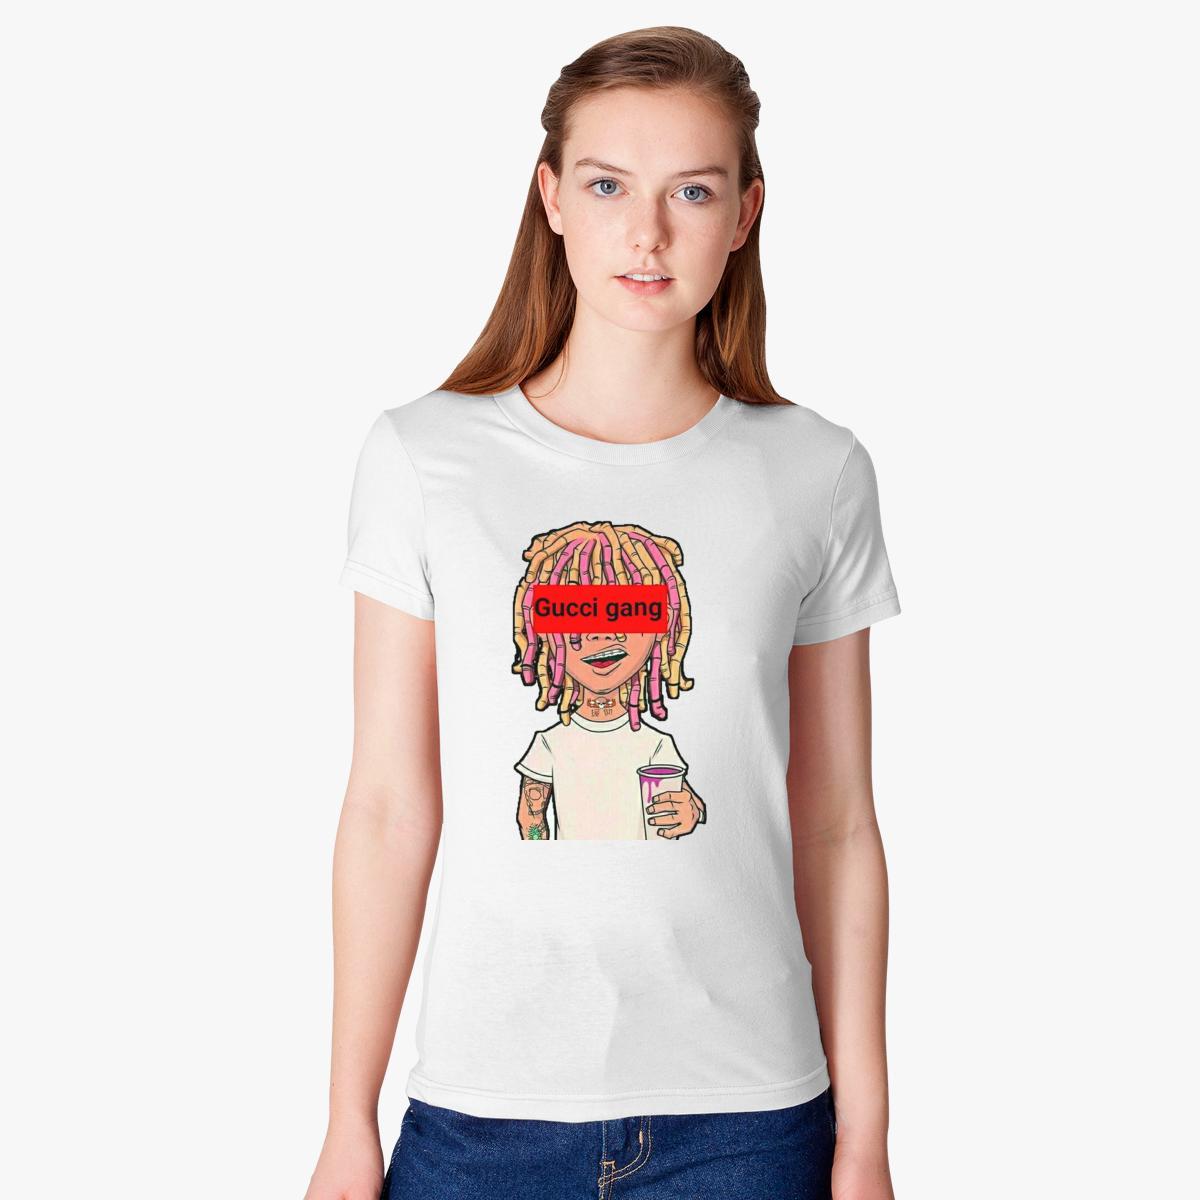 abadabc1ff3b Gucci T Shirt Womens White